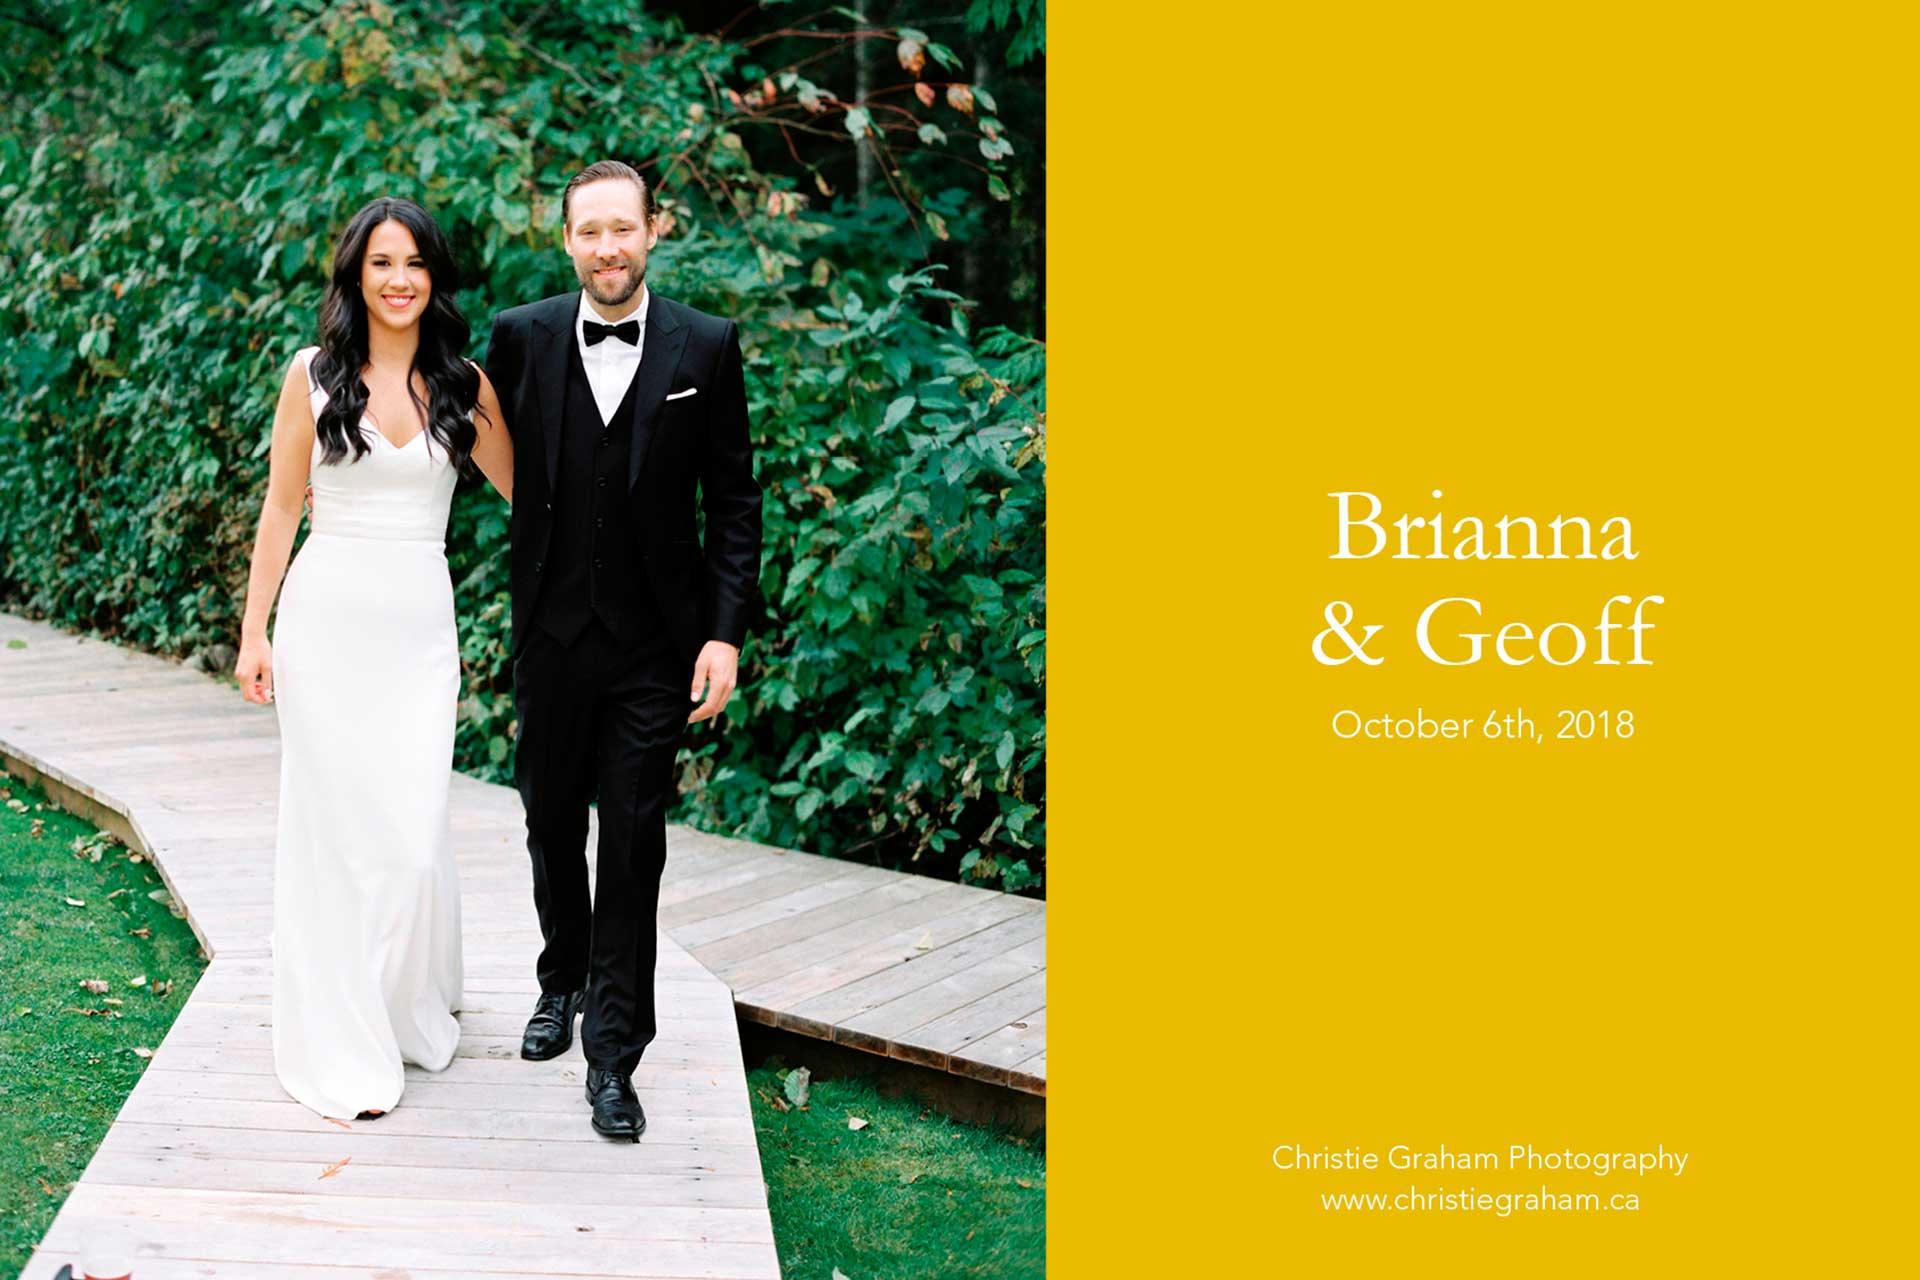 Brianna and Geoff's Wedding